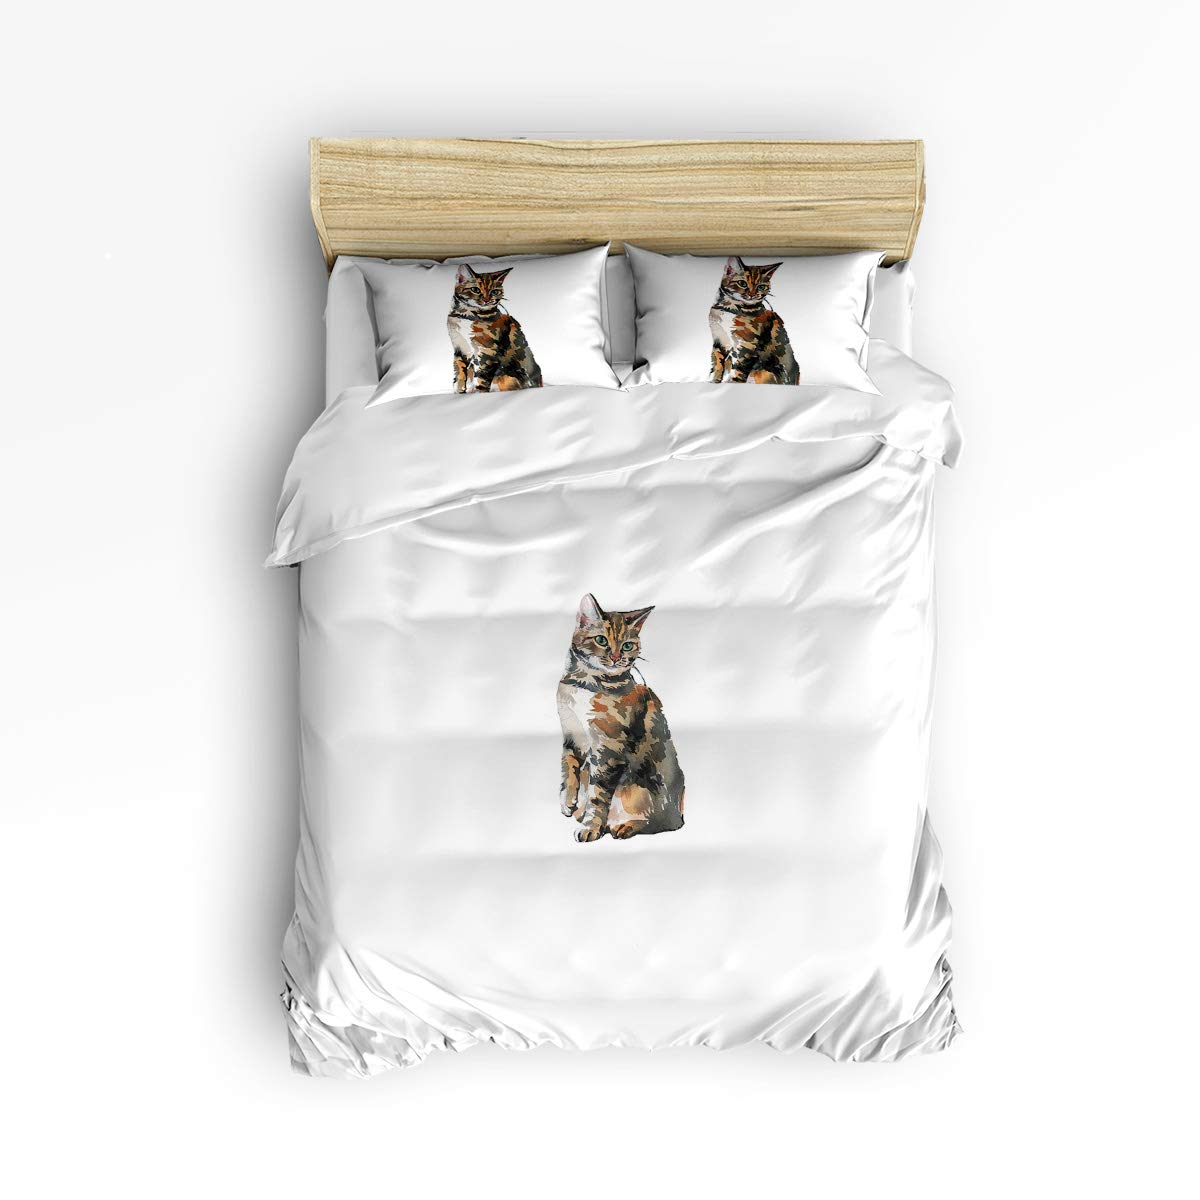 YEHO アートギャラリーキュート3ピース布団カバーセット ソフトベッドセット 子供 男の子 女の子 かわいい猫 動物の食べ物の模様 寝具セット 掛け布団カバー 枕カバー2枚付き Twin Size 20181212whlwhlyagsjSLXM01103SJSAYAG B07LB749DN Cat993lyag1041 Twin Size